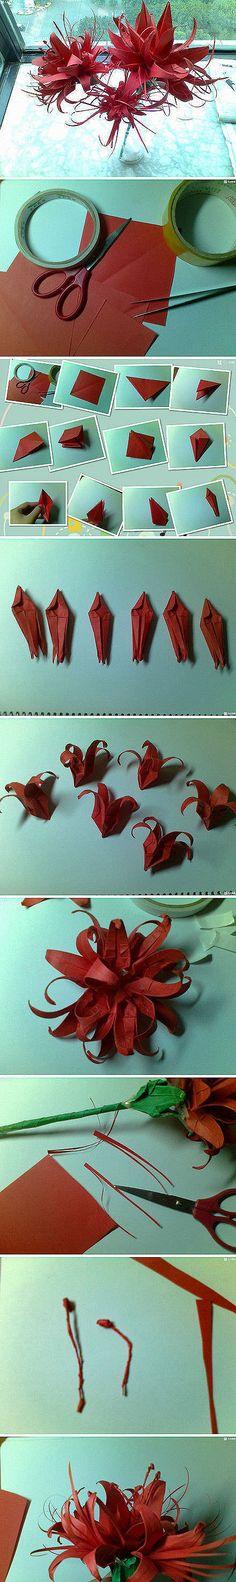 Origami DIY handmade paper art origami tutorial Bana, beautiful, right, moving hands to ~